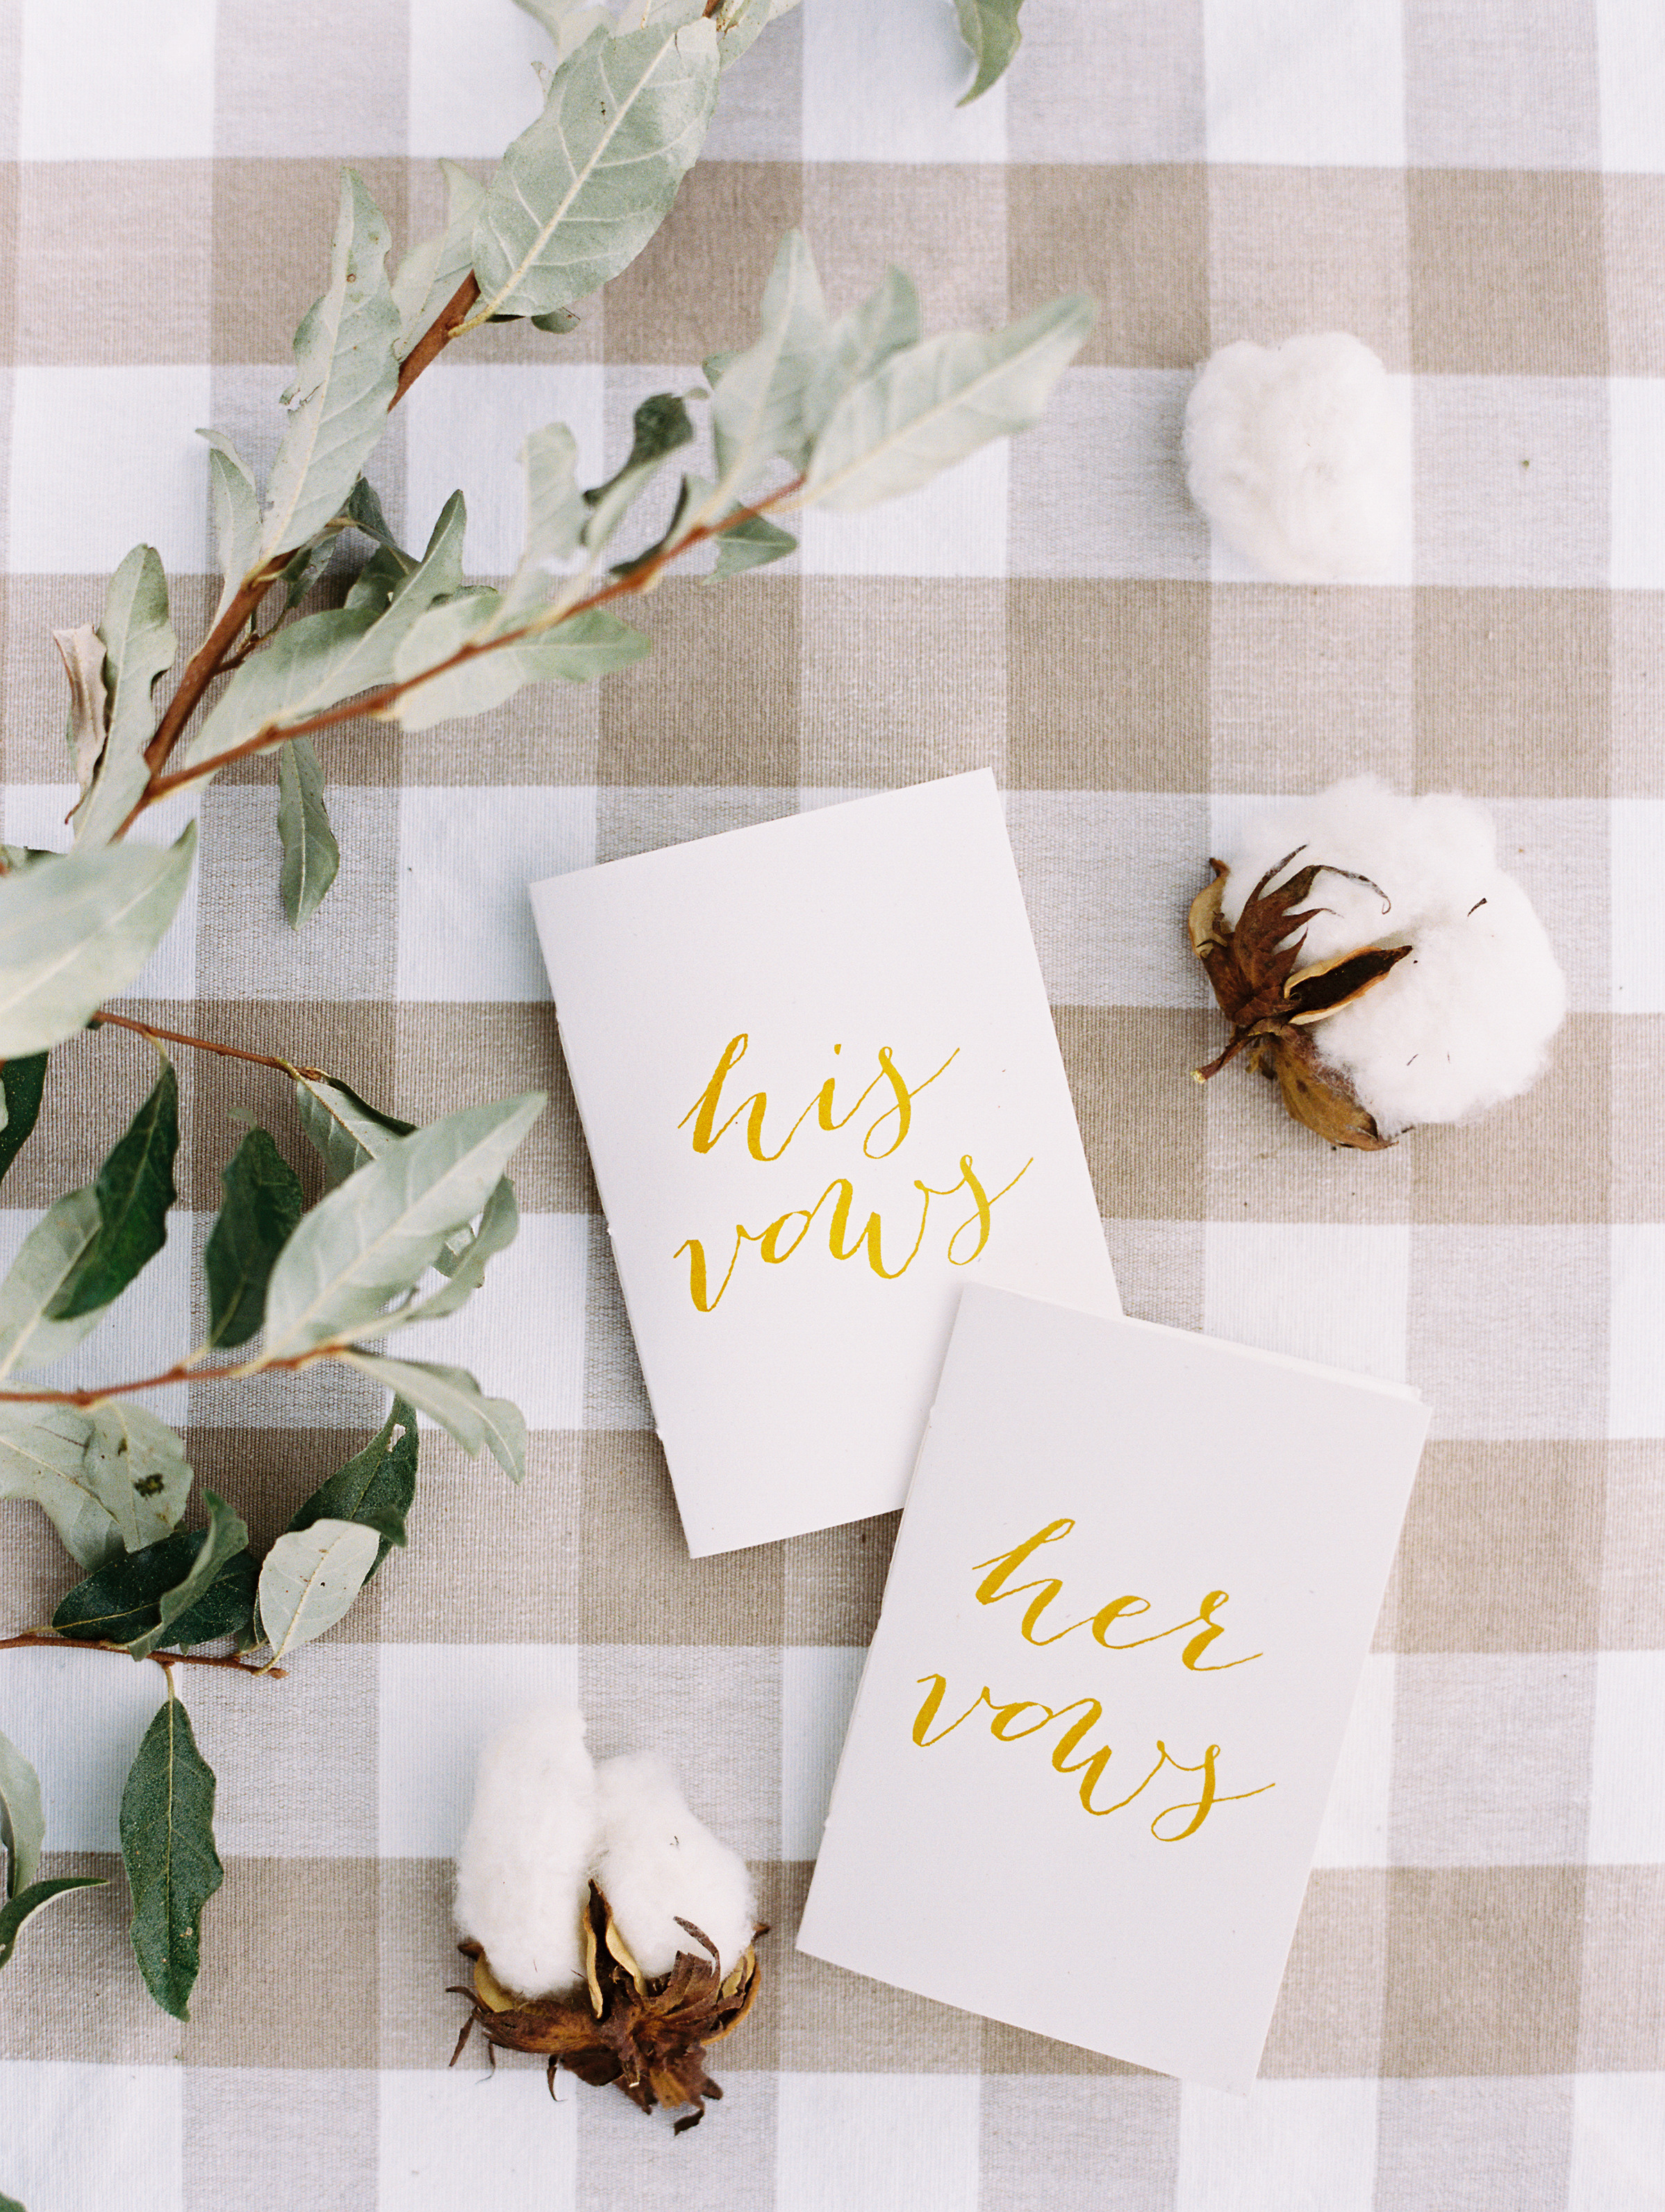 kendall nick wedding vow books